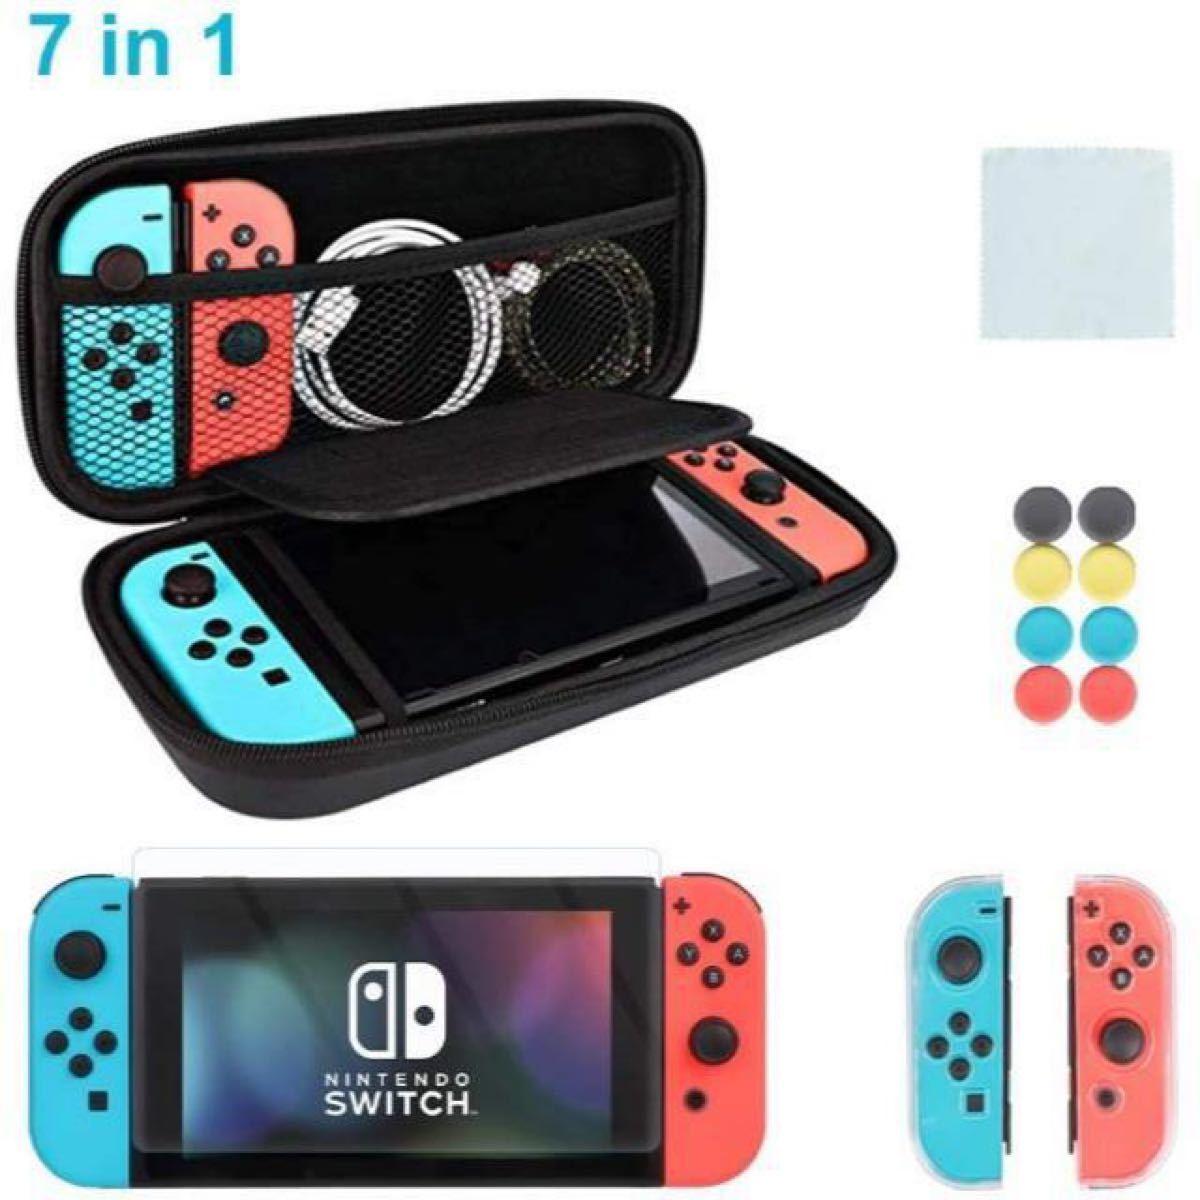 Nintendo Switch 任天堂スイッチ ネオンブルー Nintendo